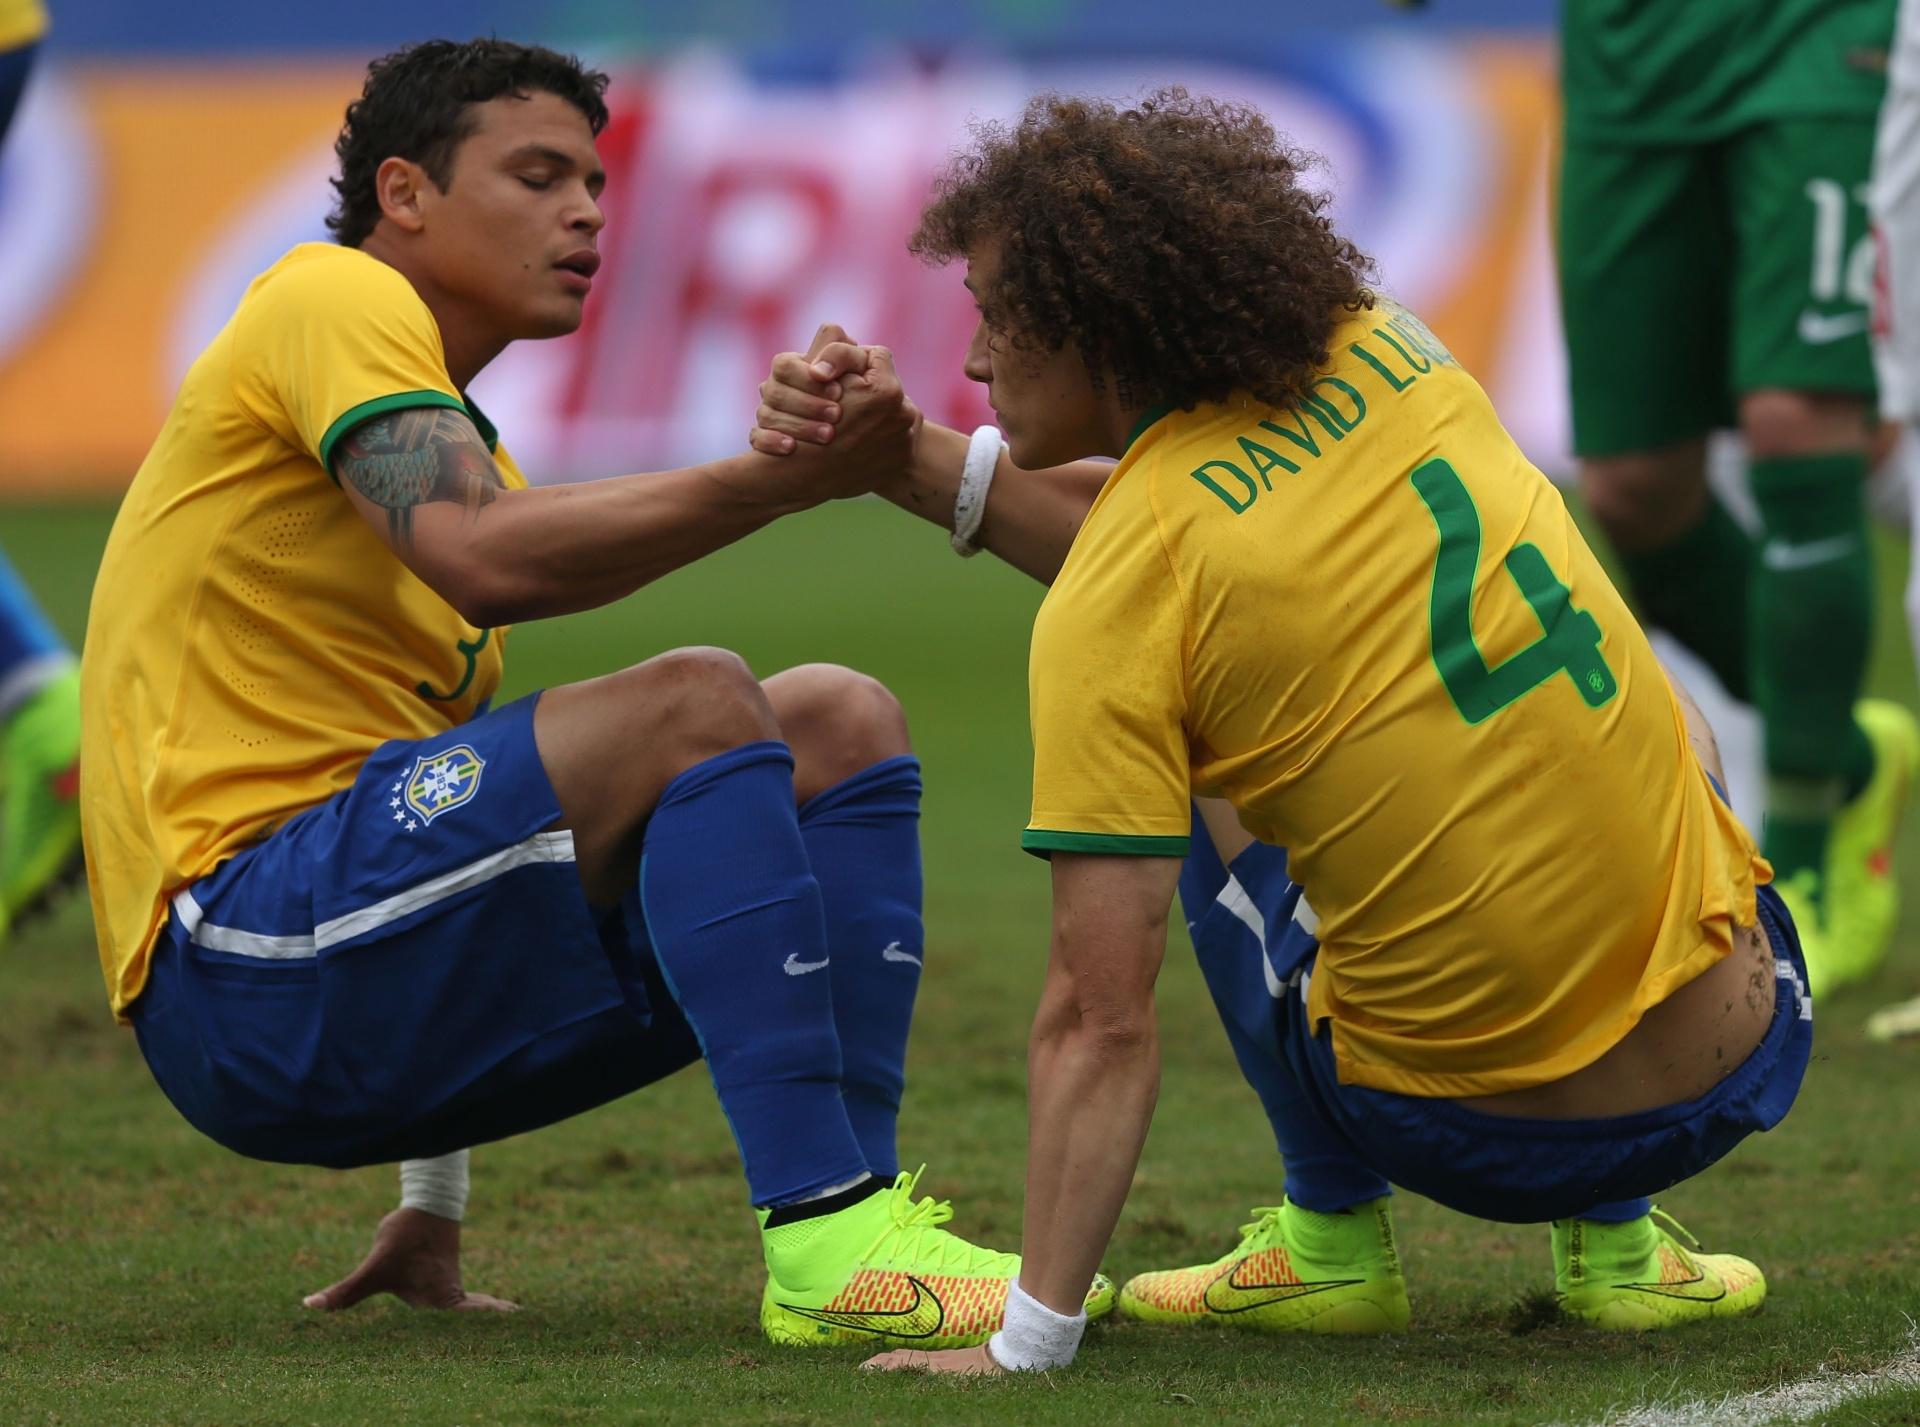 thiago-silva-e-david-luiz-ajudam-se-mutualmente-a-levantar-durante-amistoso-entre-brasil-e-servia-no-morumbi-1402094304346_1920x1427